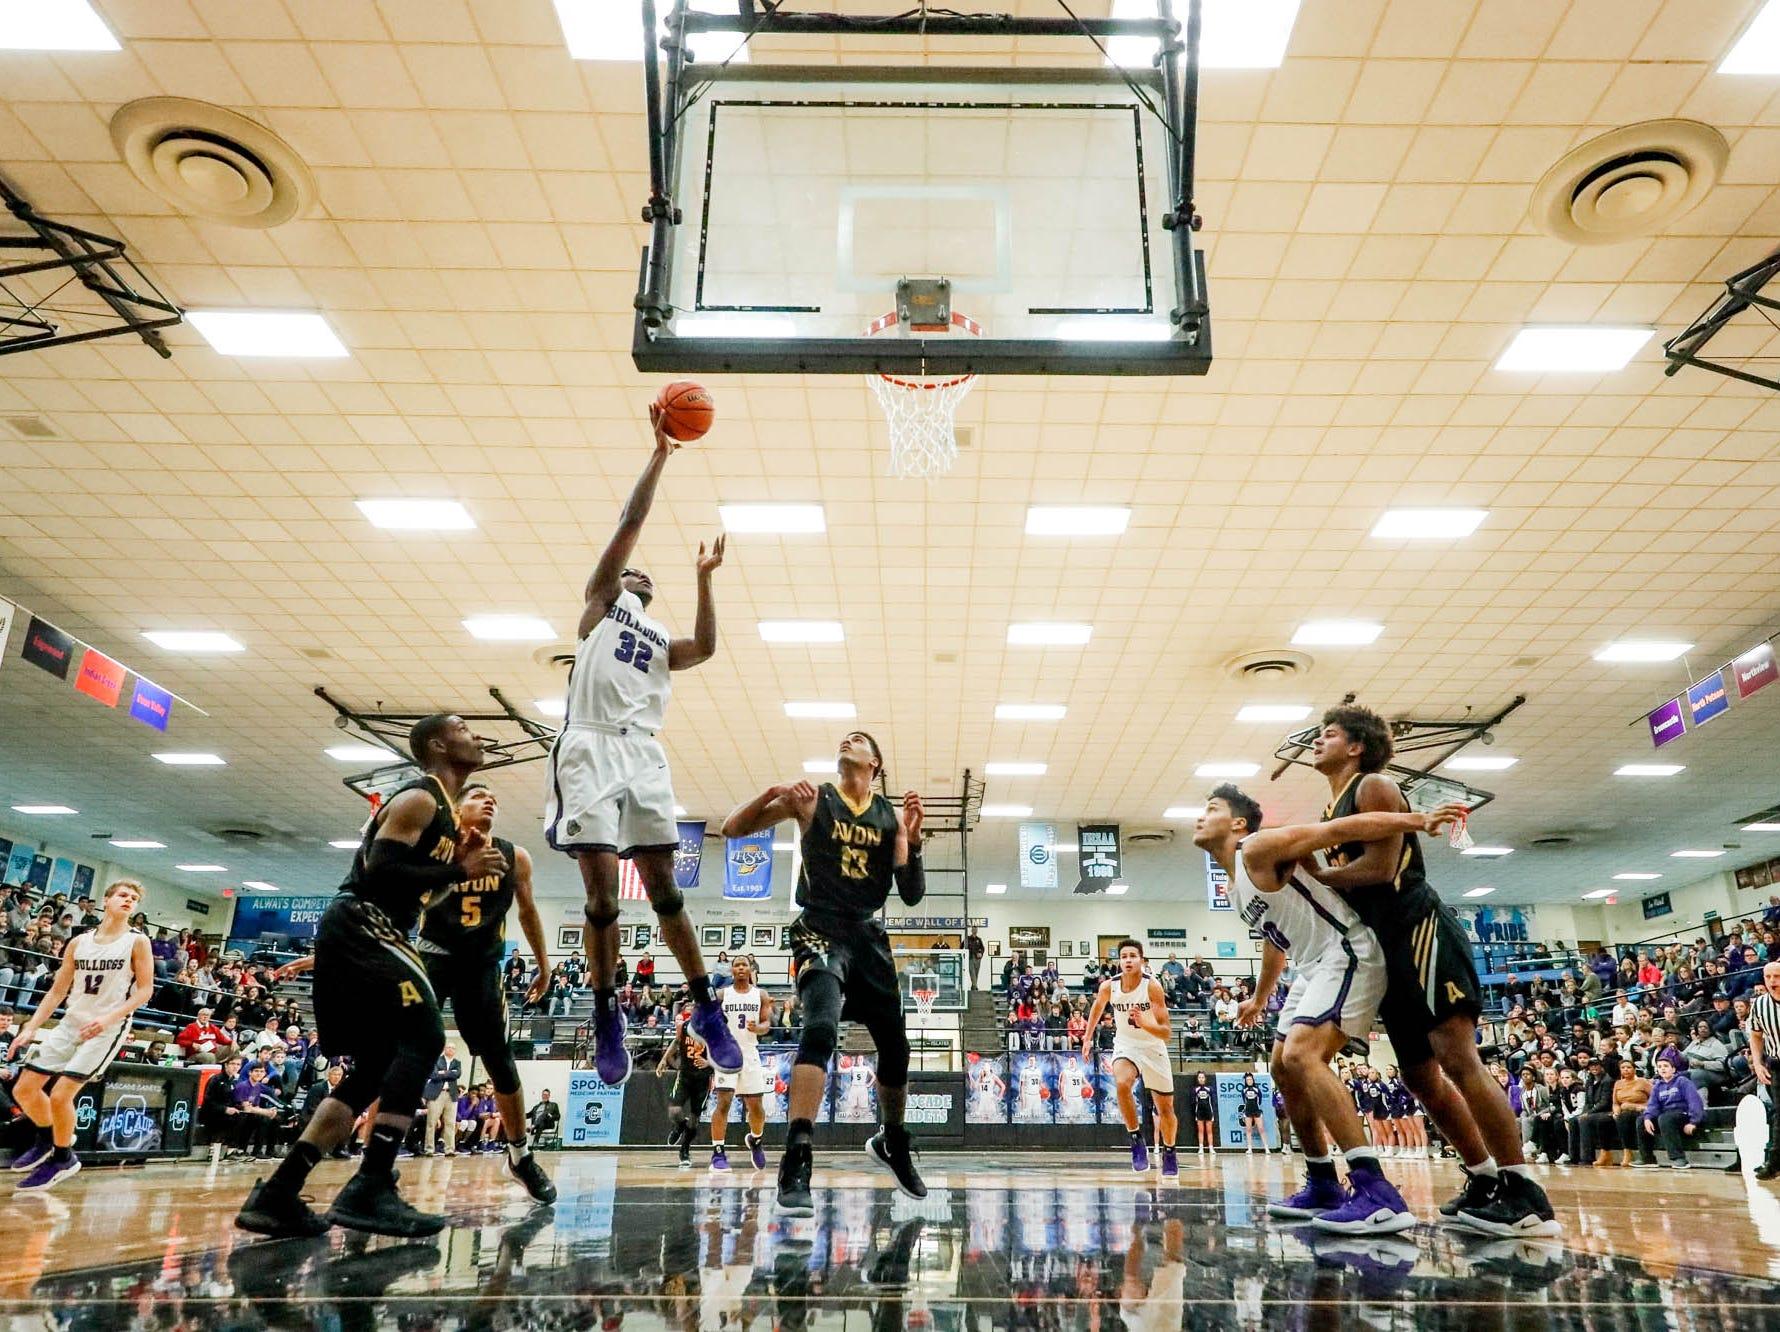 Brownsburg High School's Malek Edmonds (32) shoots a layup during the 2019 Hendricks County Basketball Tournament game between the Avon High School boys varsity basketball team and Brownsburg High School, held at Cascade High School on Saturday, Jan. 5, 2019.